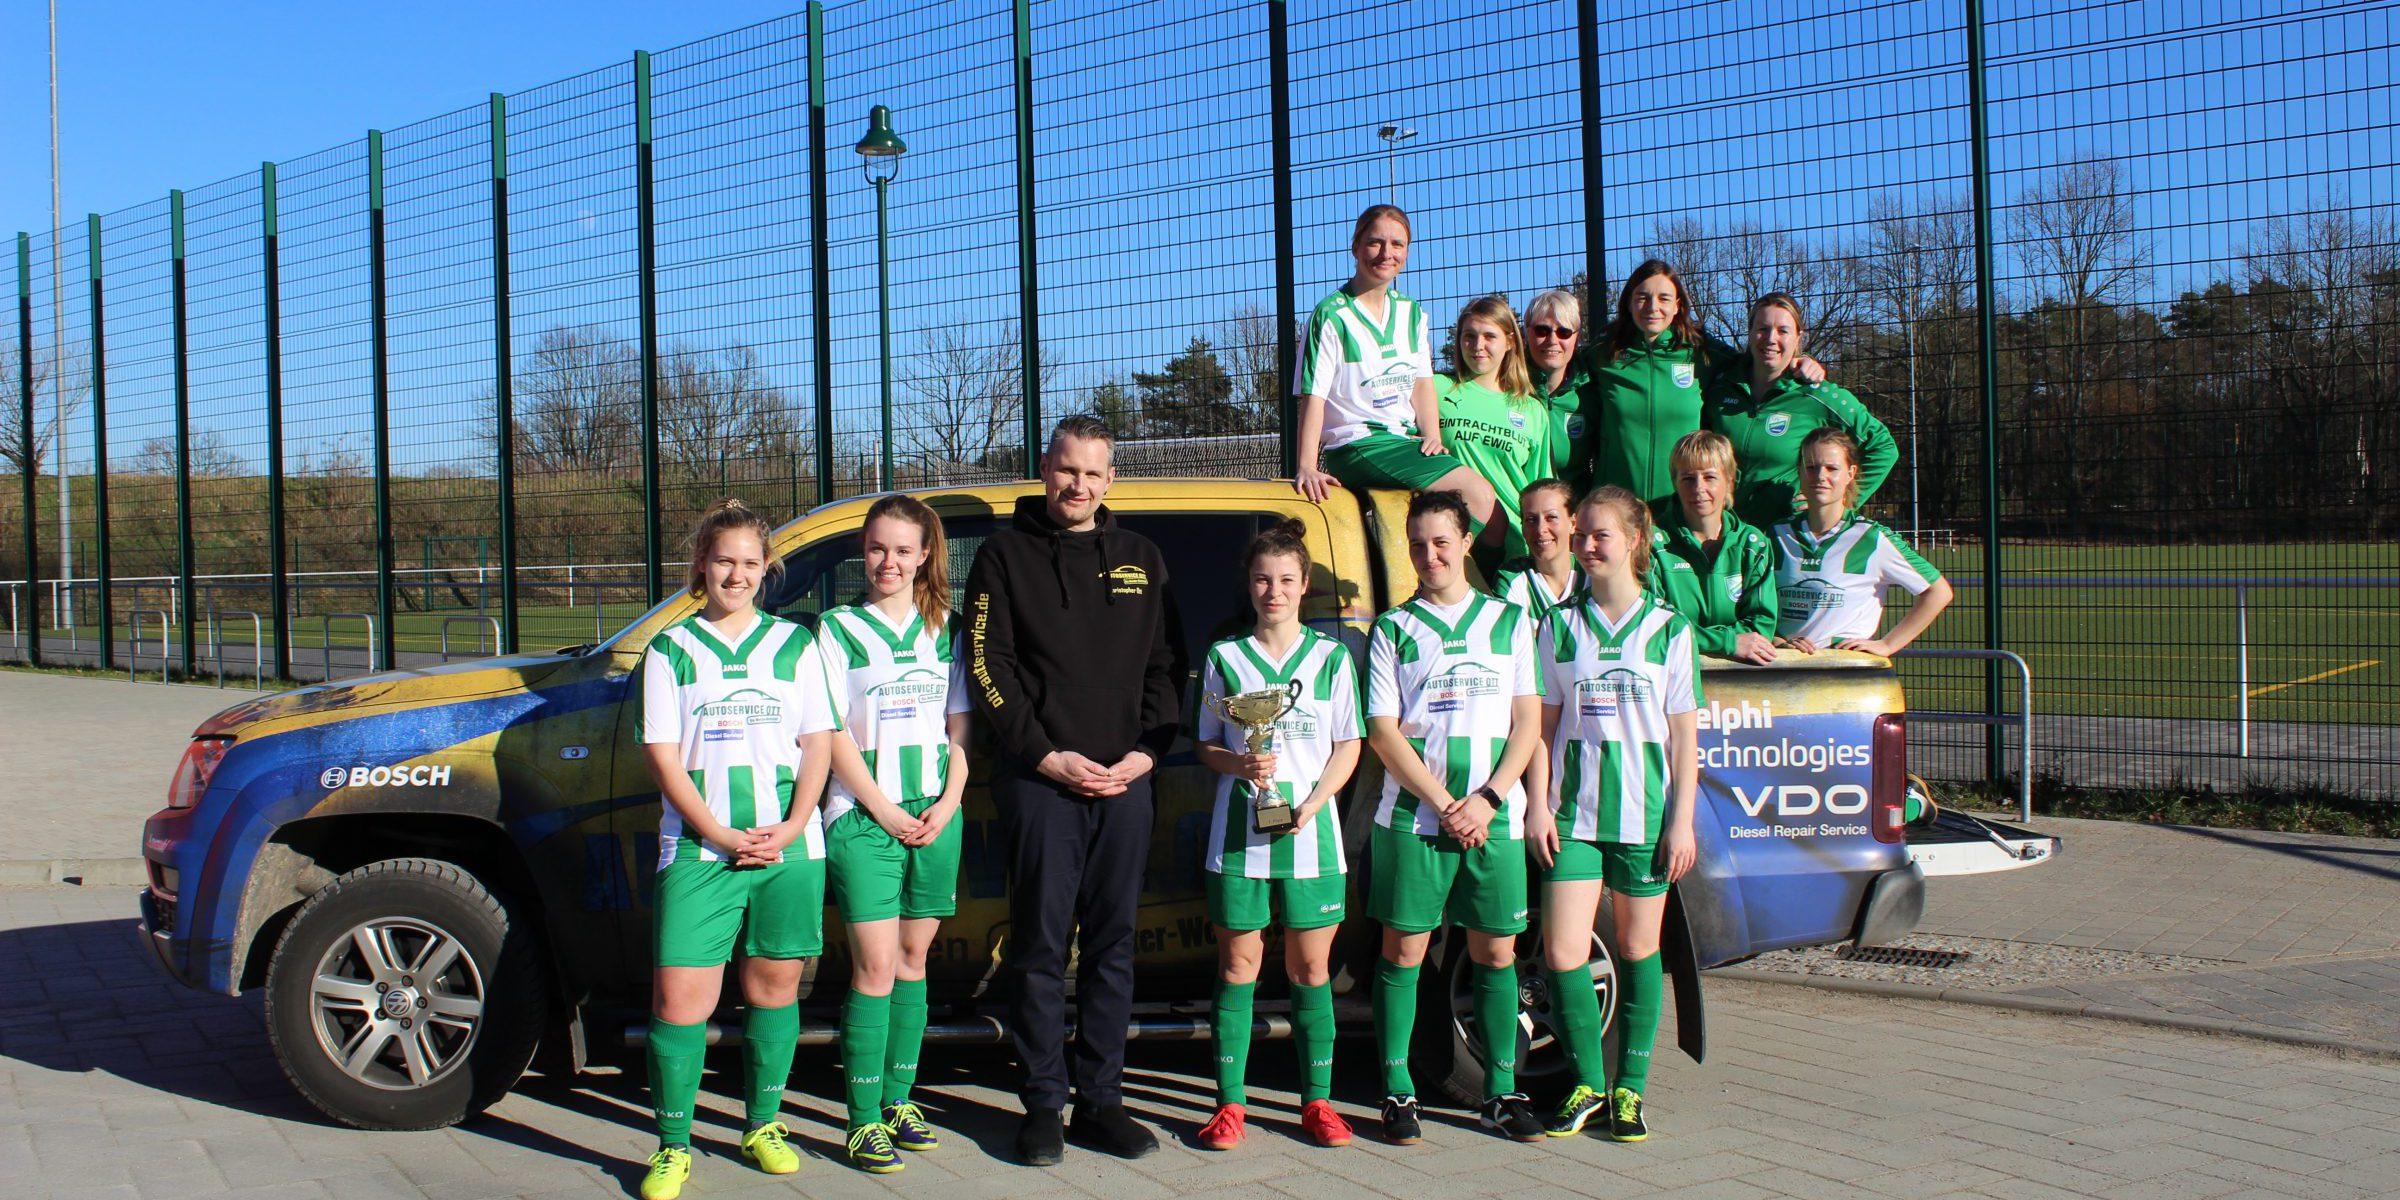 20190518 Frauenmannschaft SG Wandlitz-Basdorf mit Sponsor